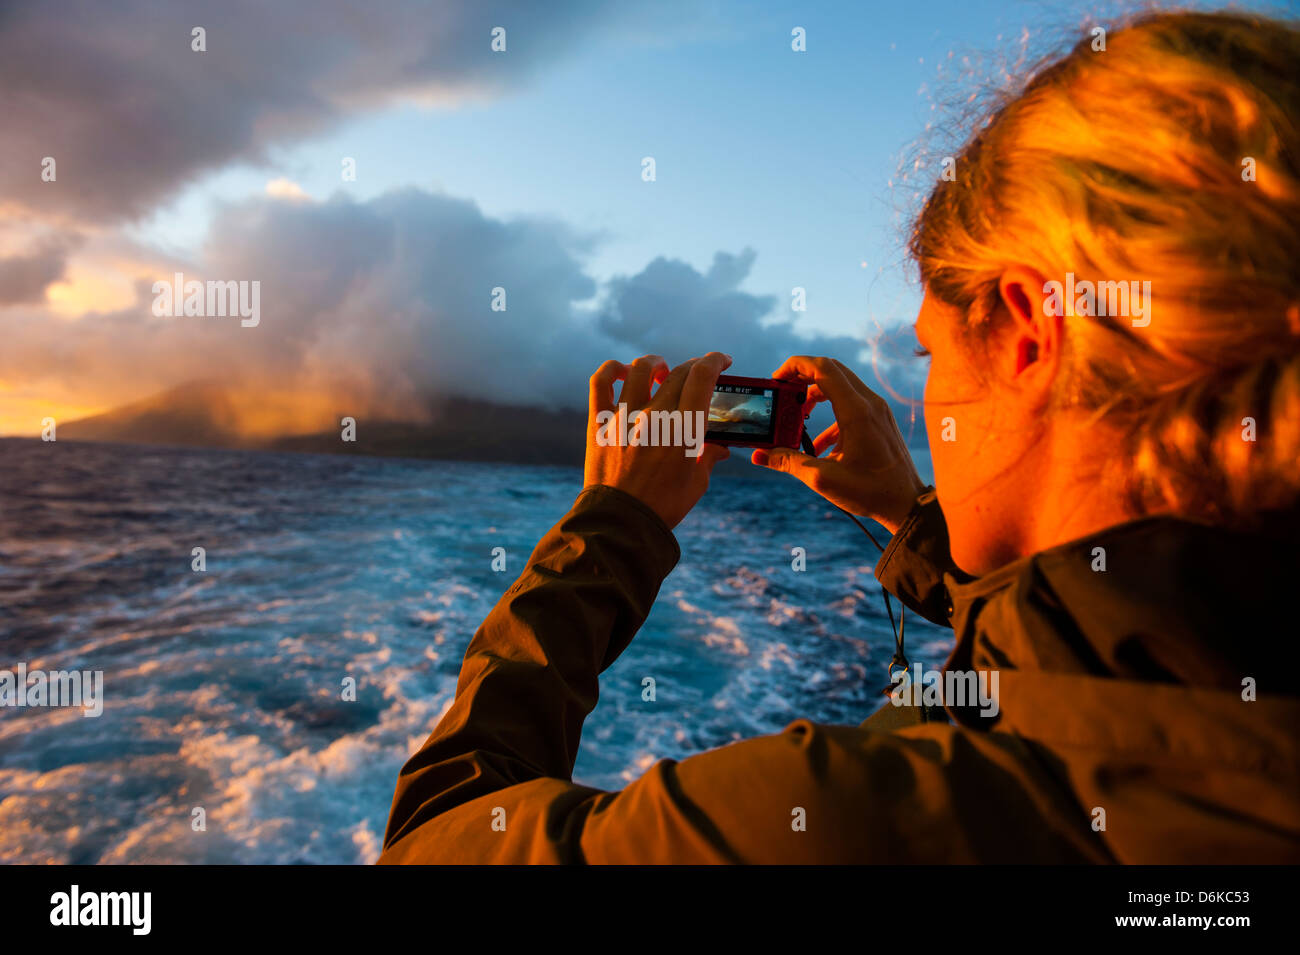 Touristeninsel fotografieren Tau bei Sonnenaufgang, Tayna Insel Gruppe, Amerikanisch-Samoa, Südsee, Pazifik Stockbild